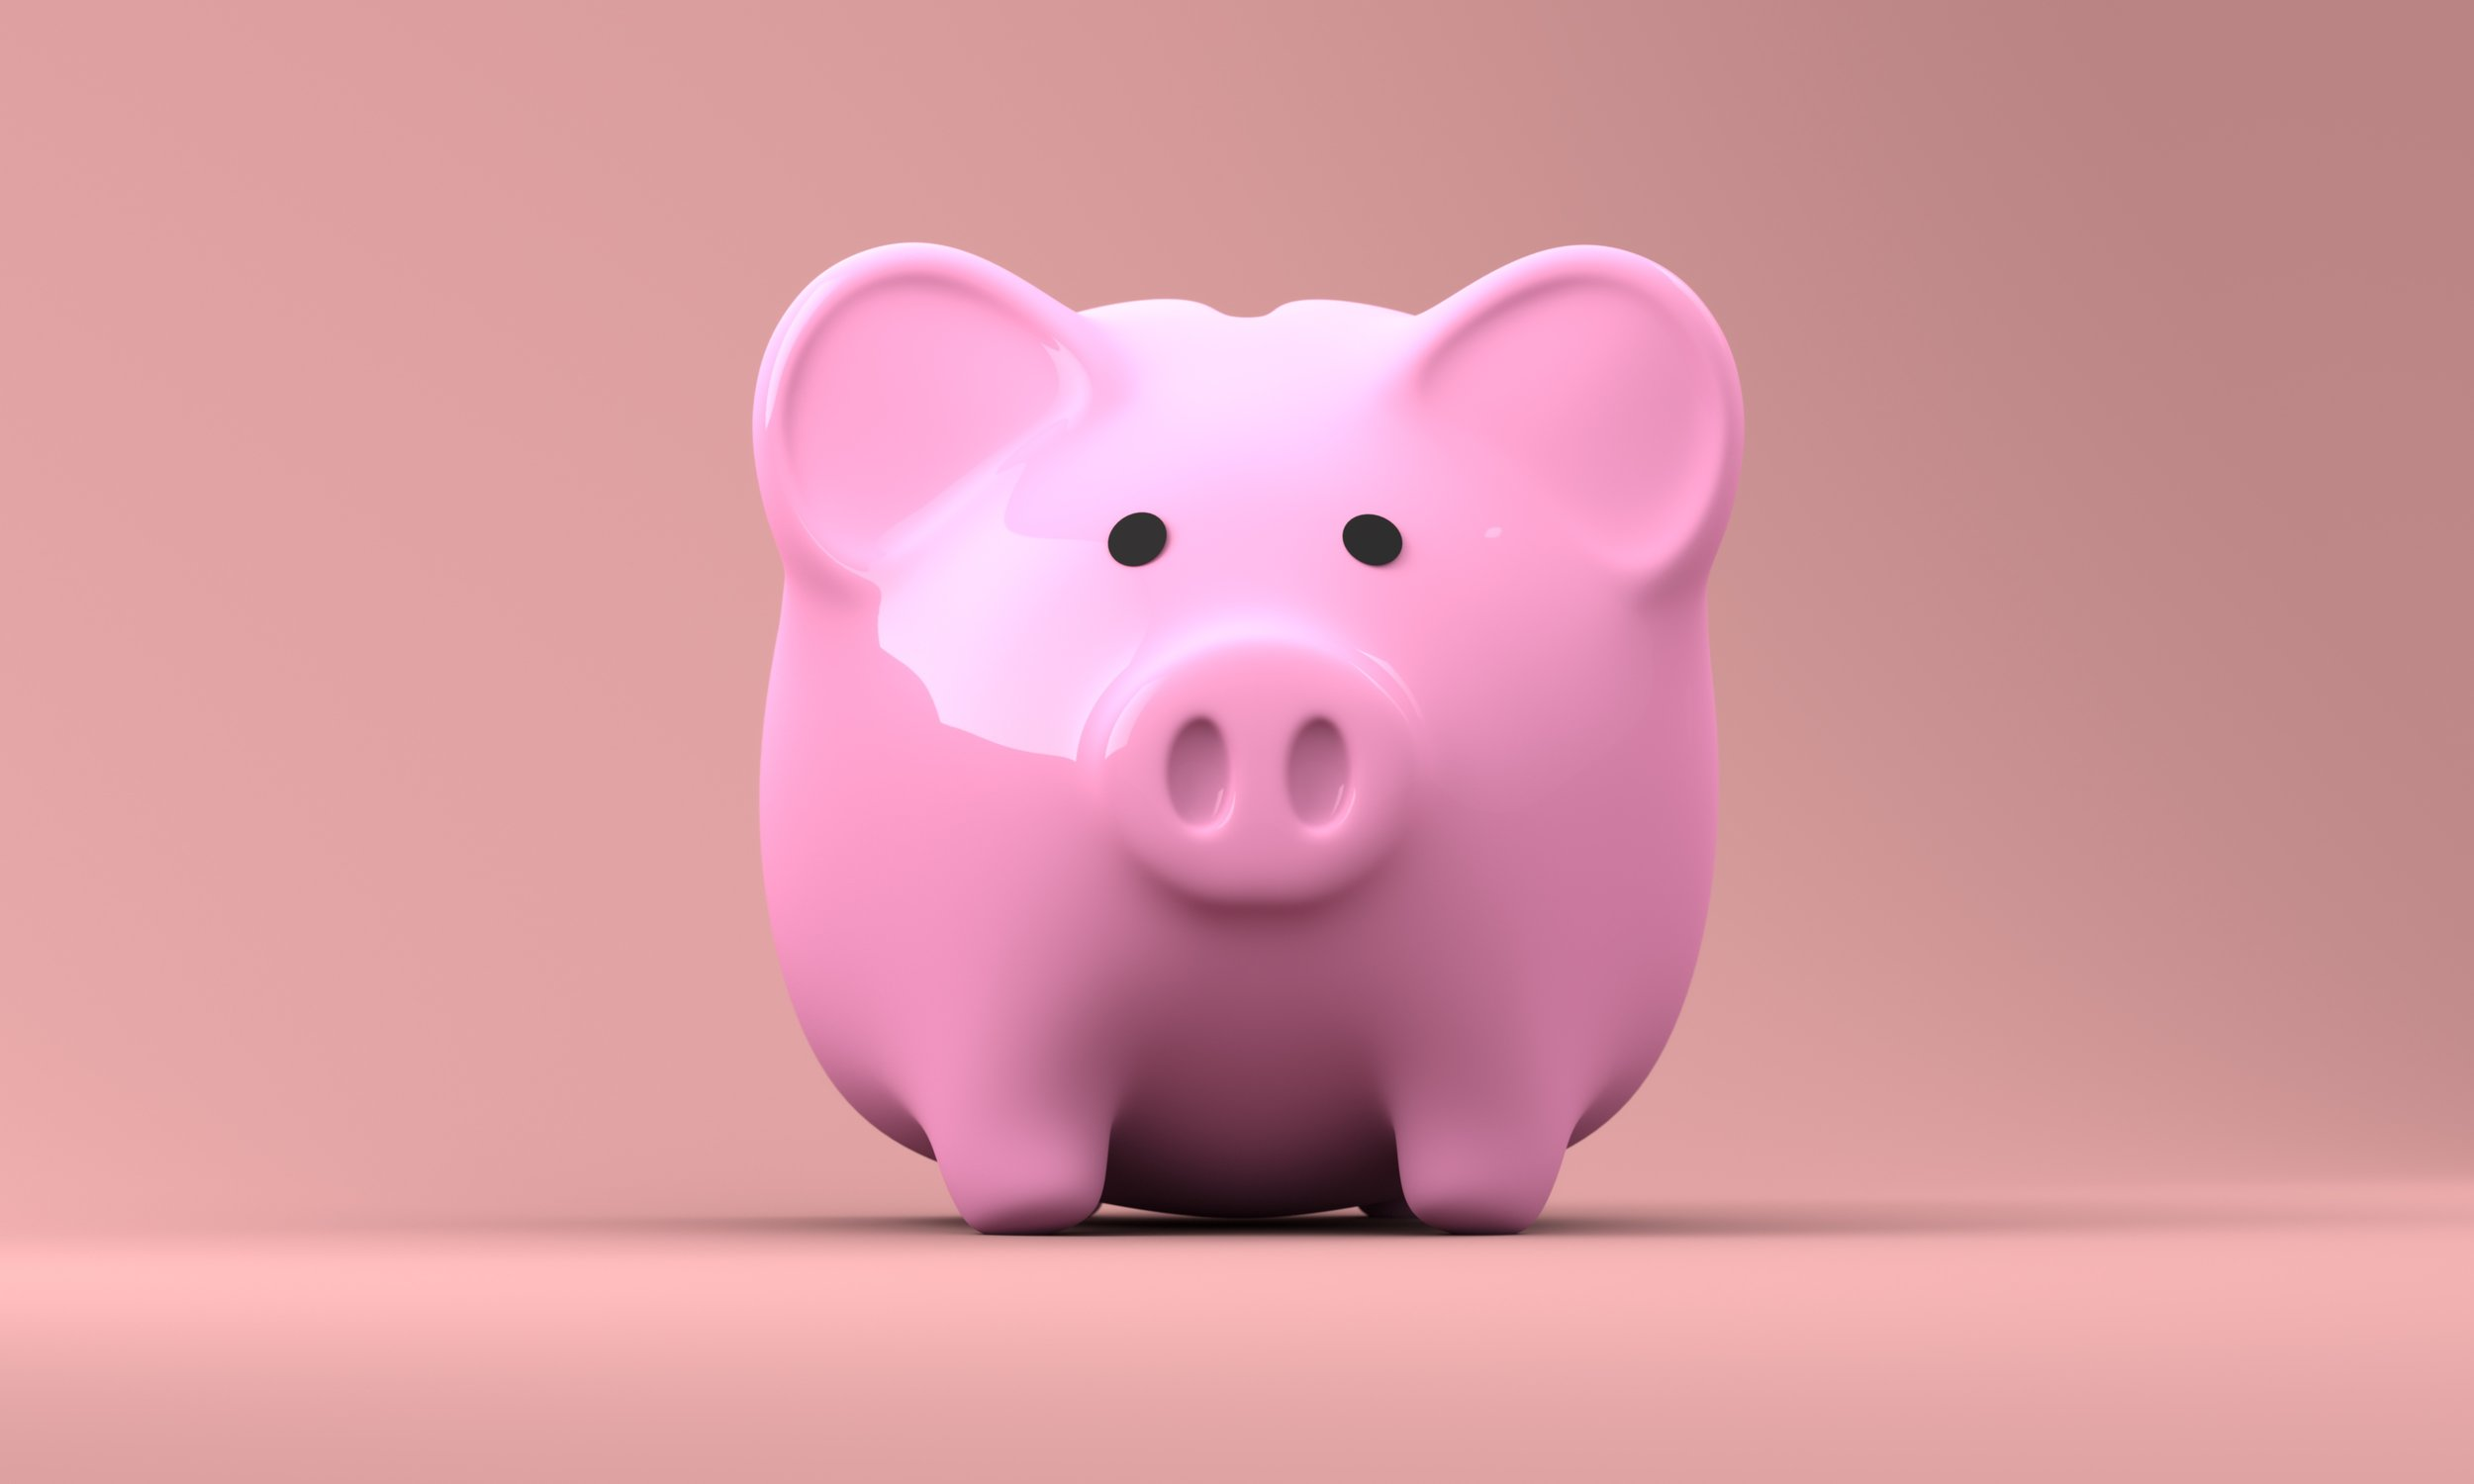 Piggy_bank_on_pink_background (1).jpg